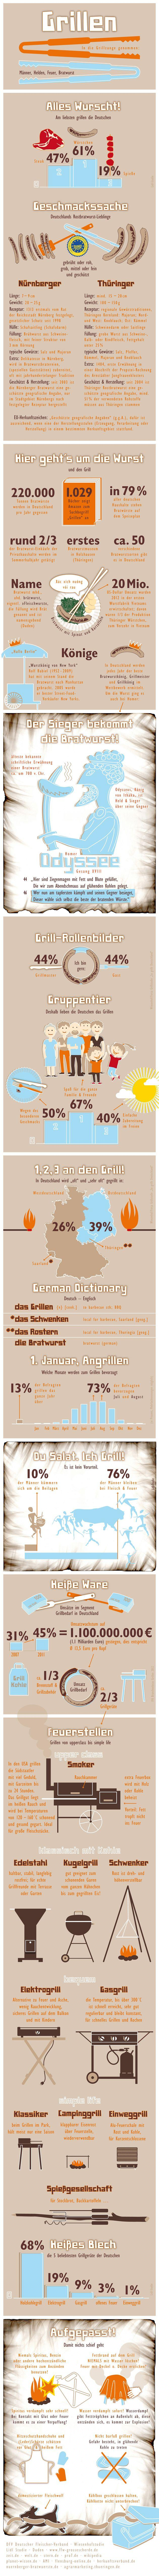 Grillen Infografik